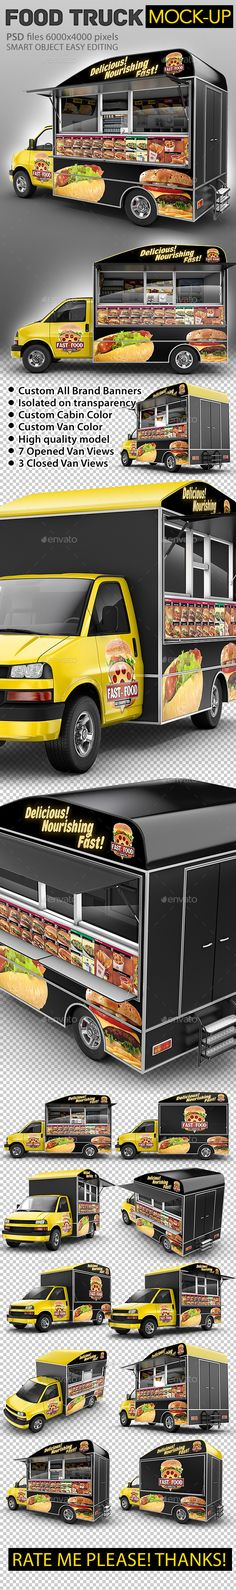 Food Truck Mock-Up. Van eatery mockup